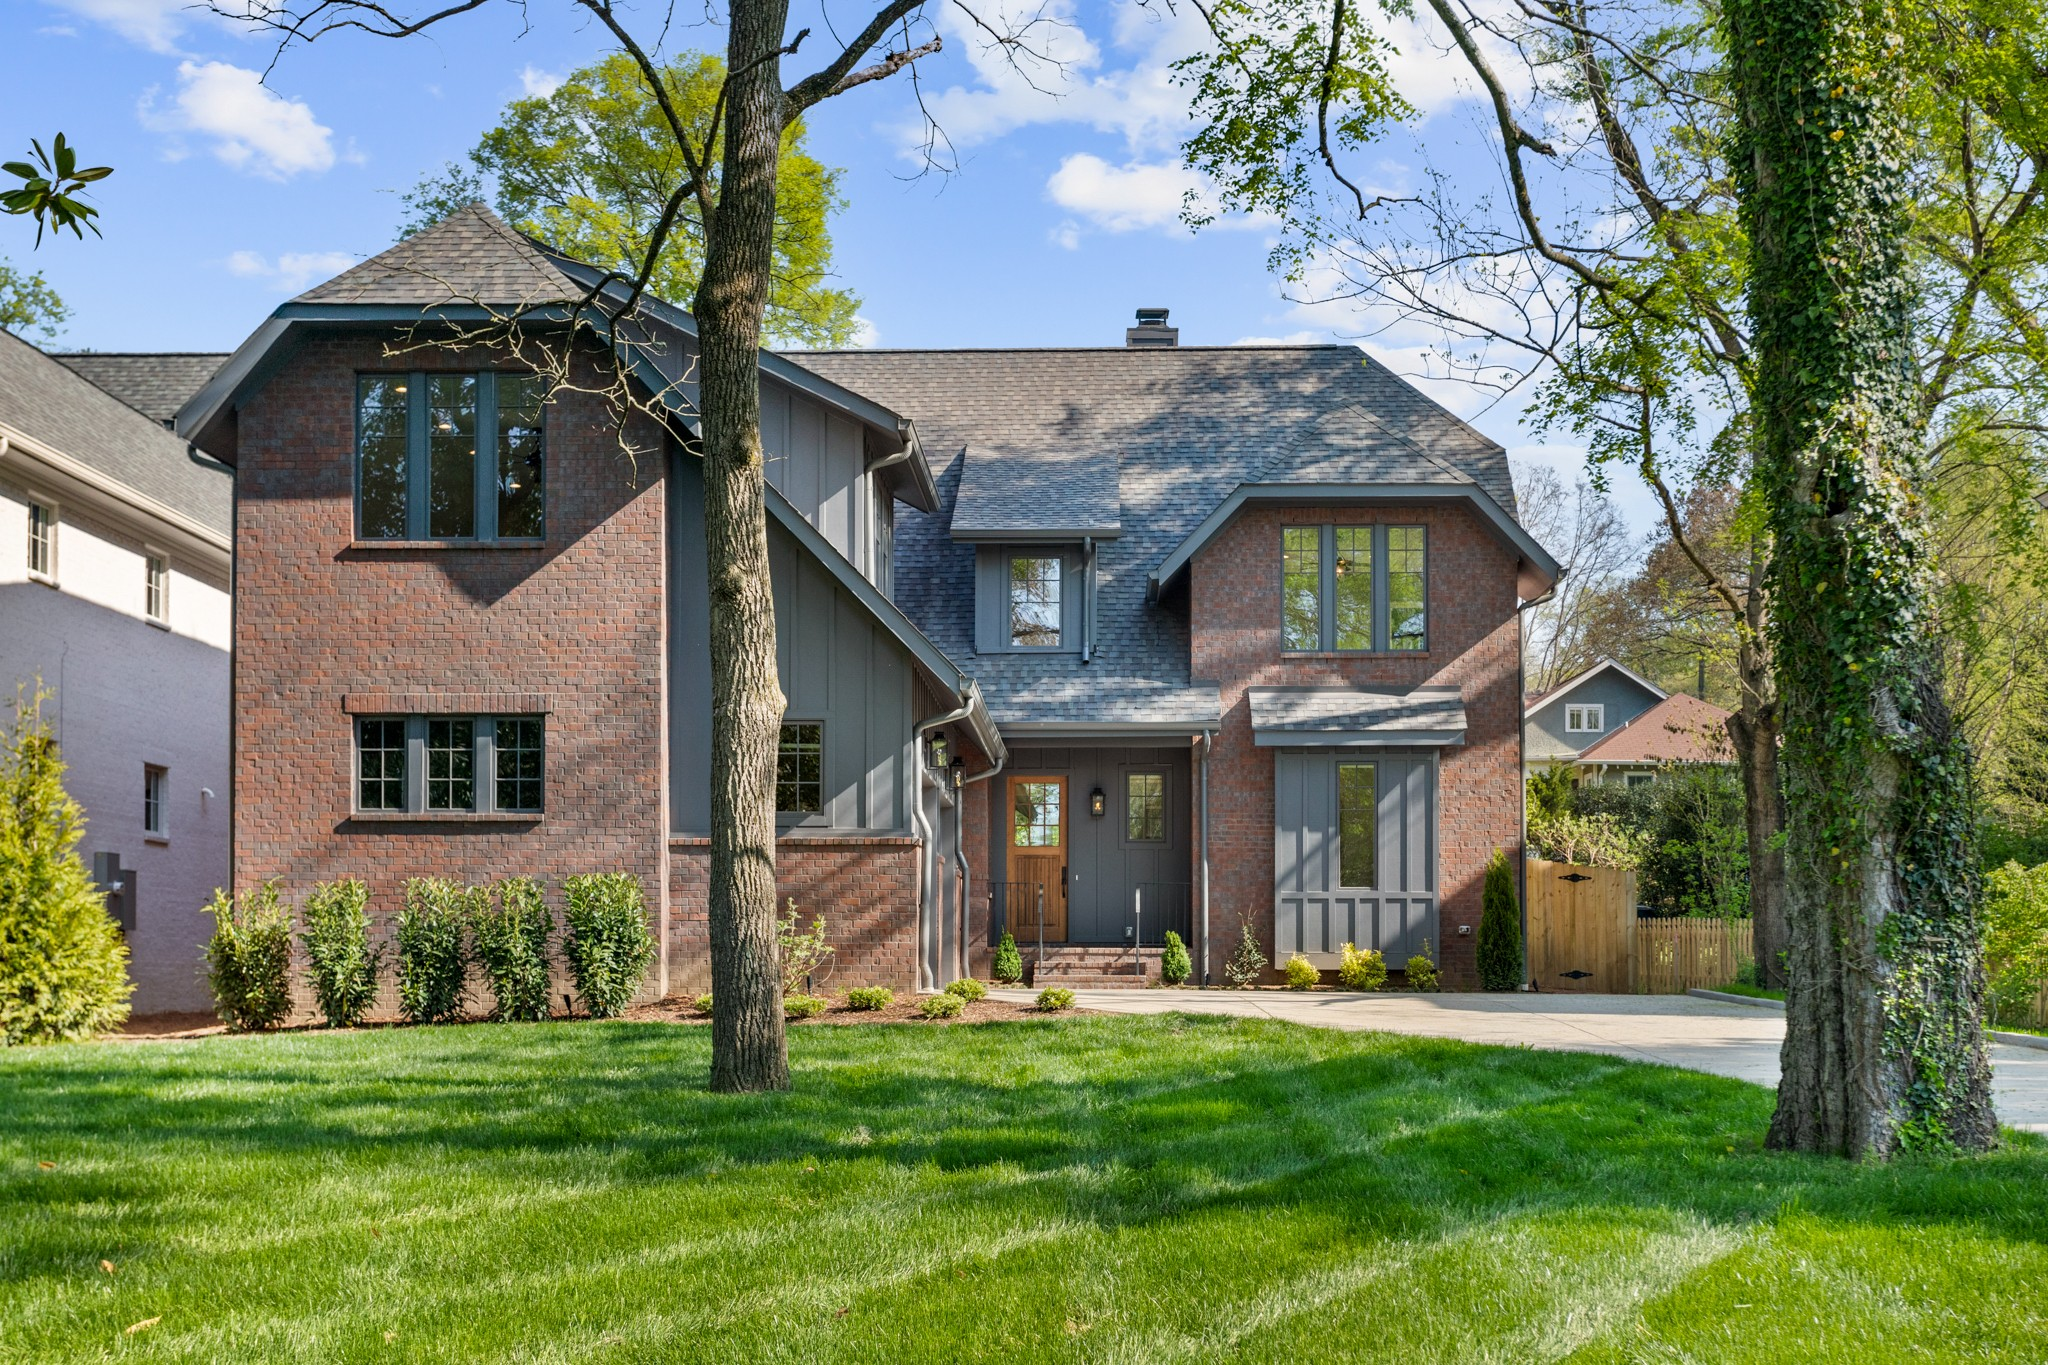 1014A Noelton Ave, Nashville, TN 37204 - Nashville, TN real estate listing